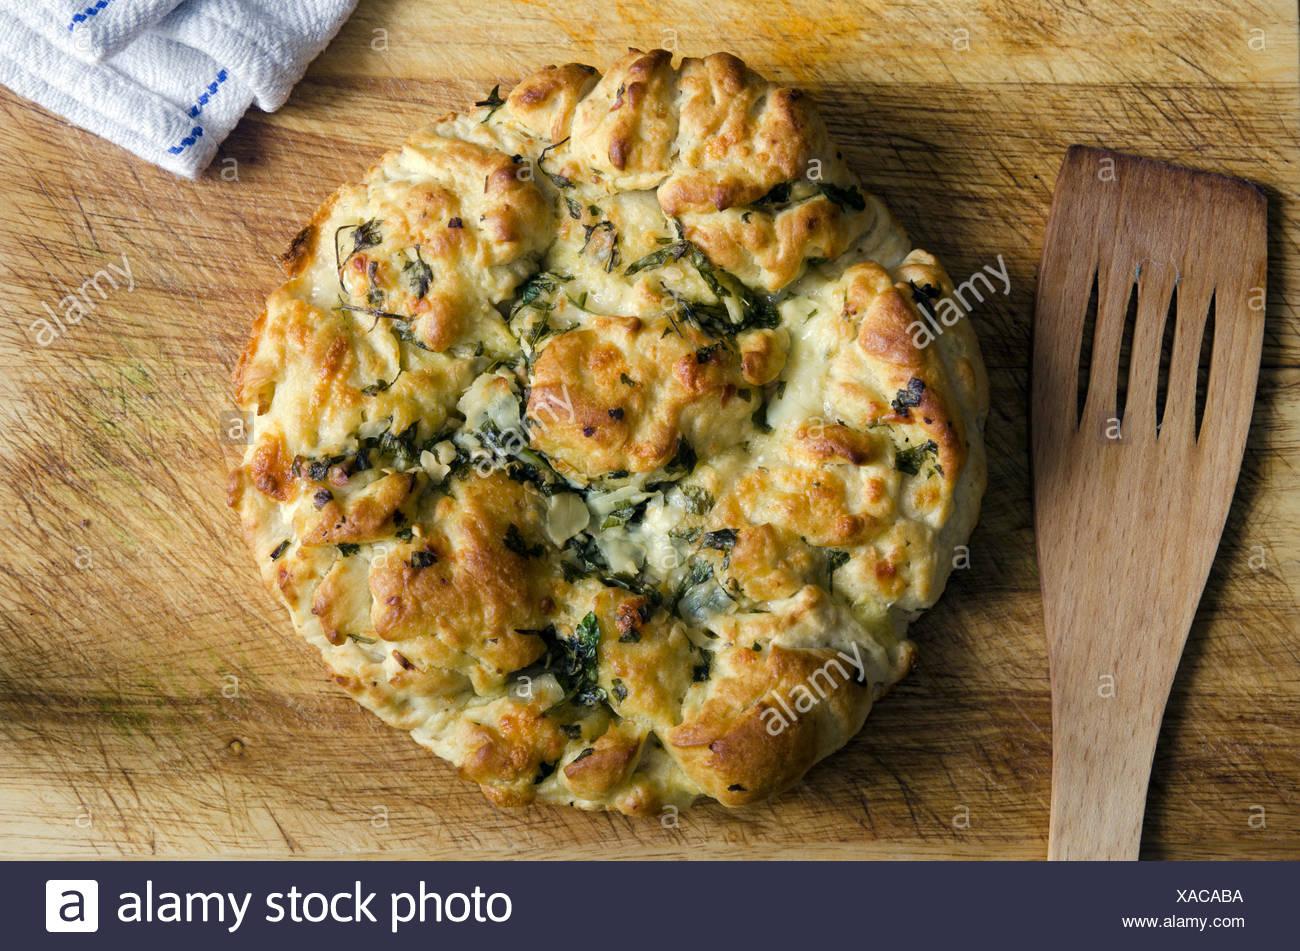 Italienischen Pecorino Provolone, Mozzarella und Brot. Stockbild